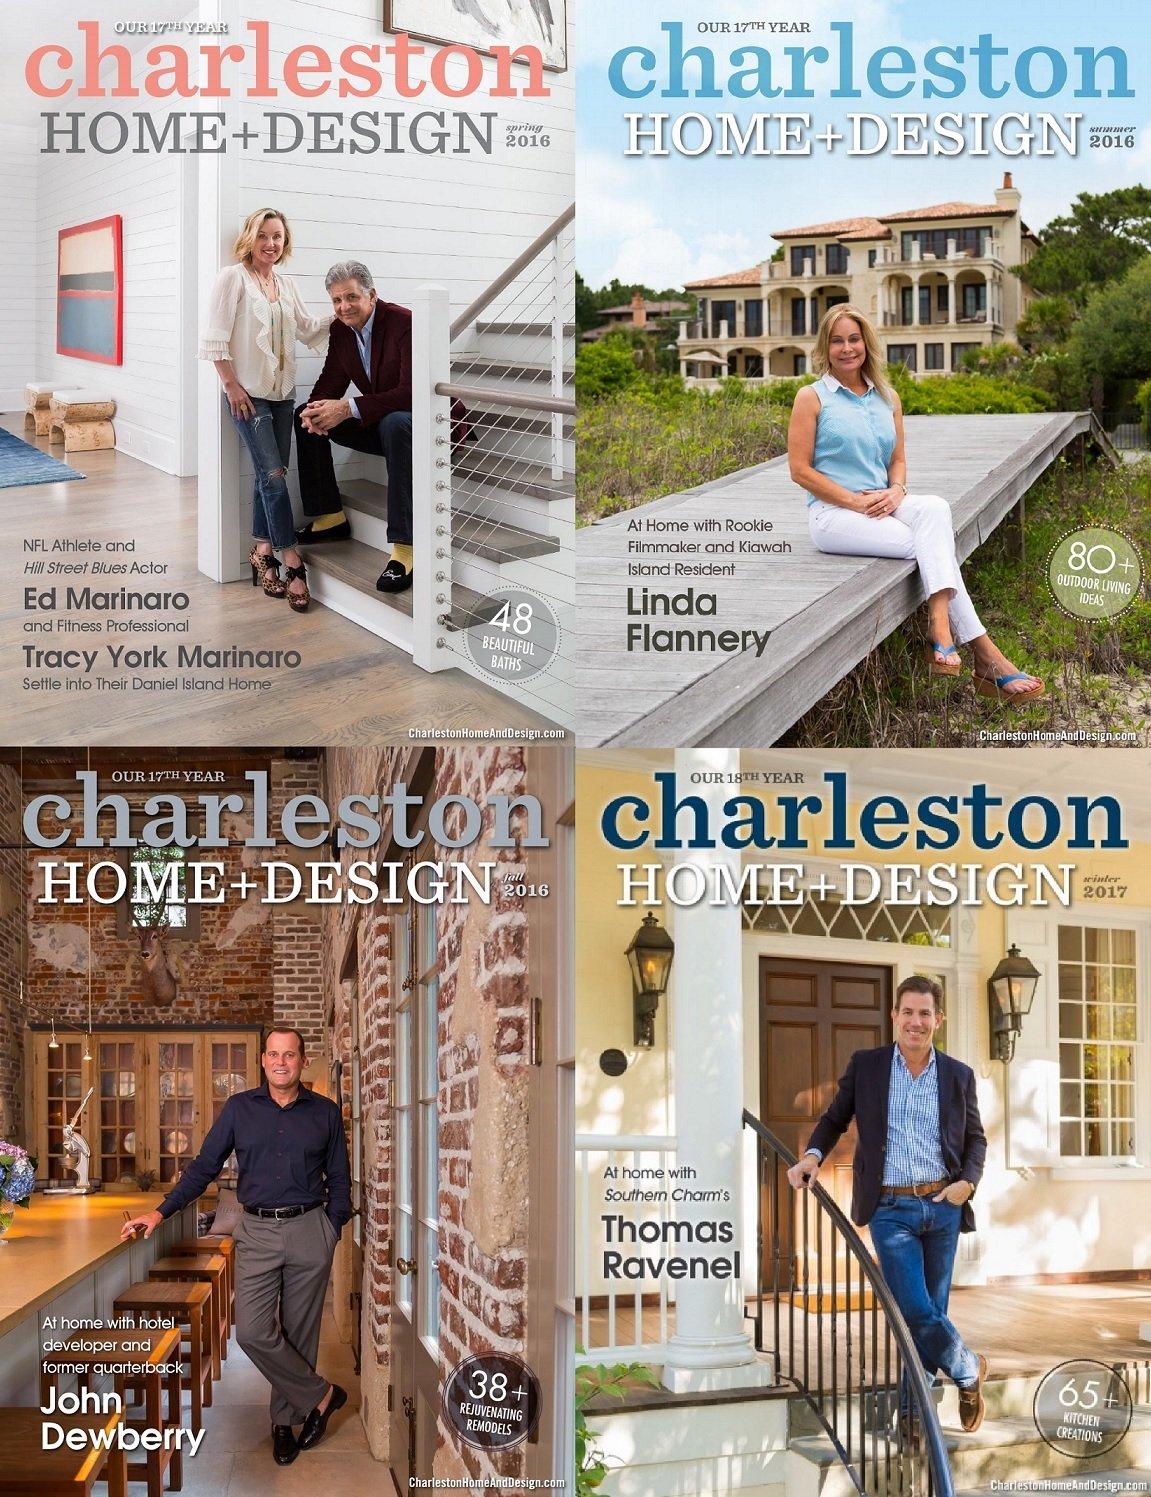 Download charleston home design 2016 full year issues for Charleston home design magazine